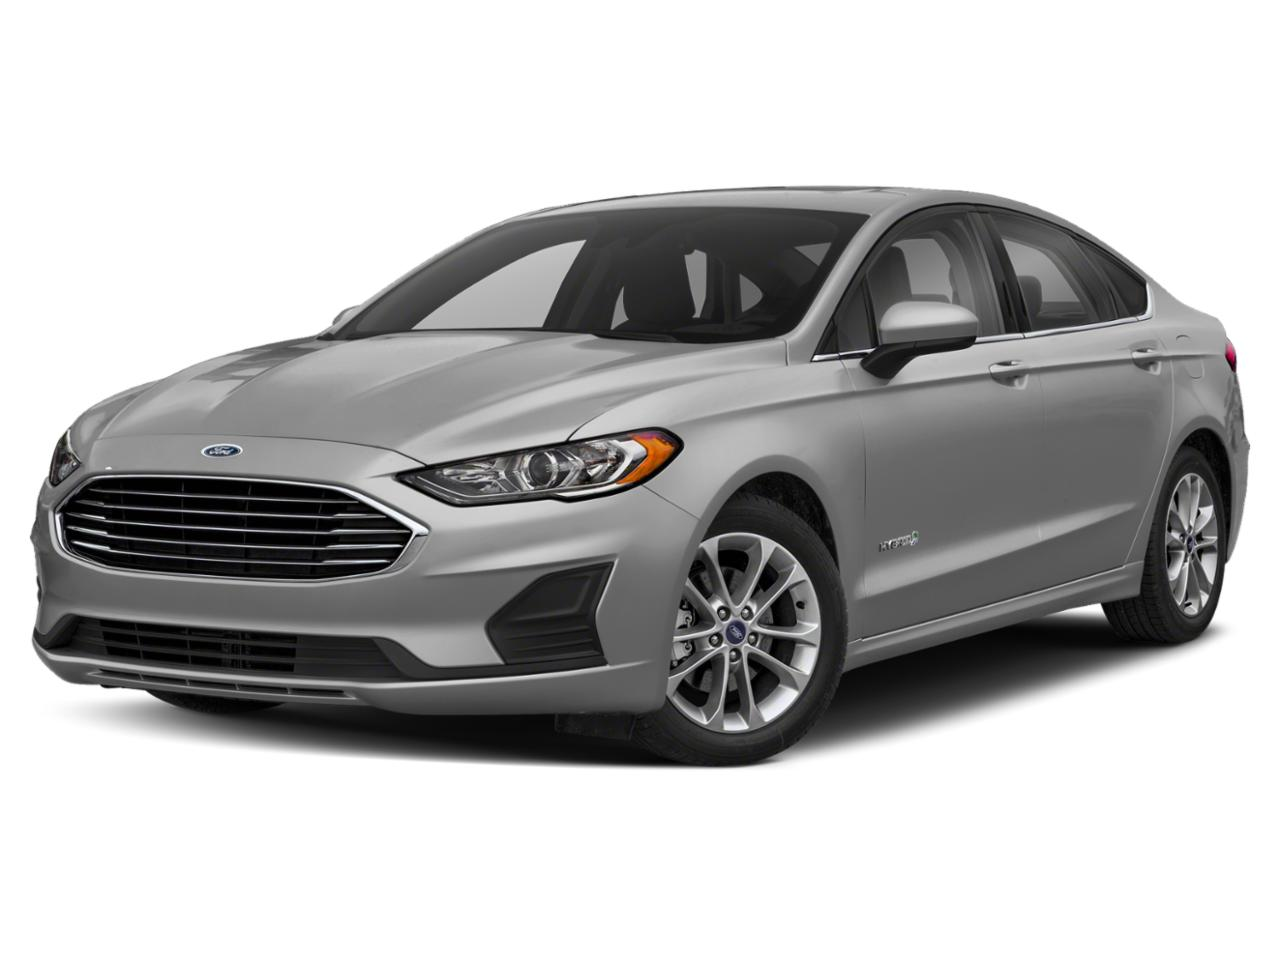 2019 Ford Fusion Hybrid TITANIUM 4dr Car Greensboro NC